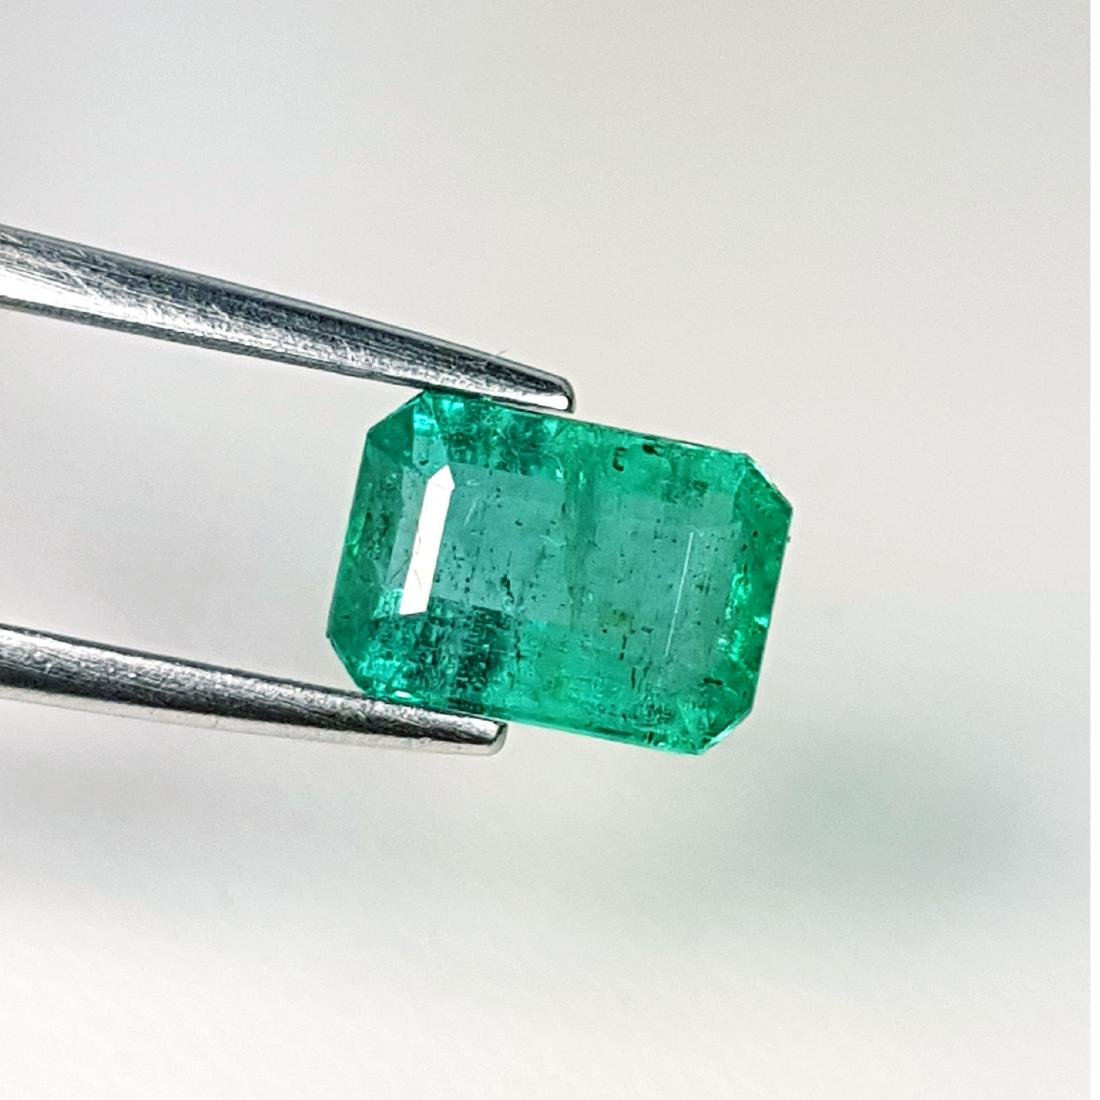 Emerald - 2.24